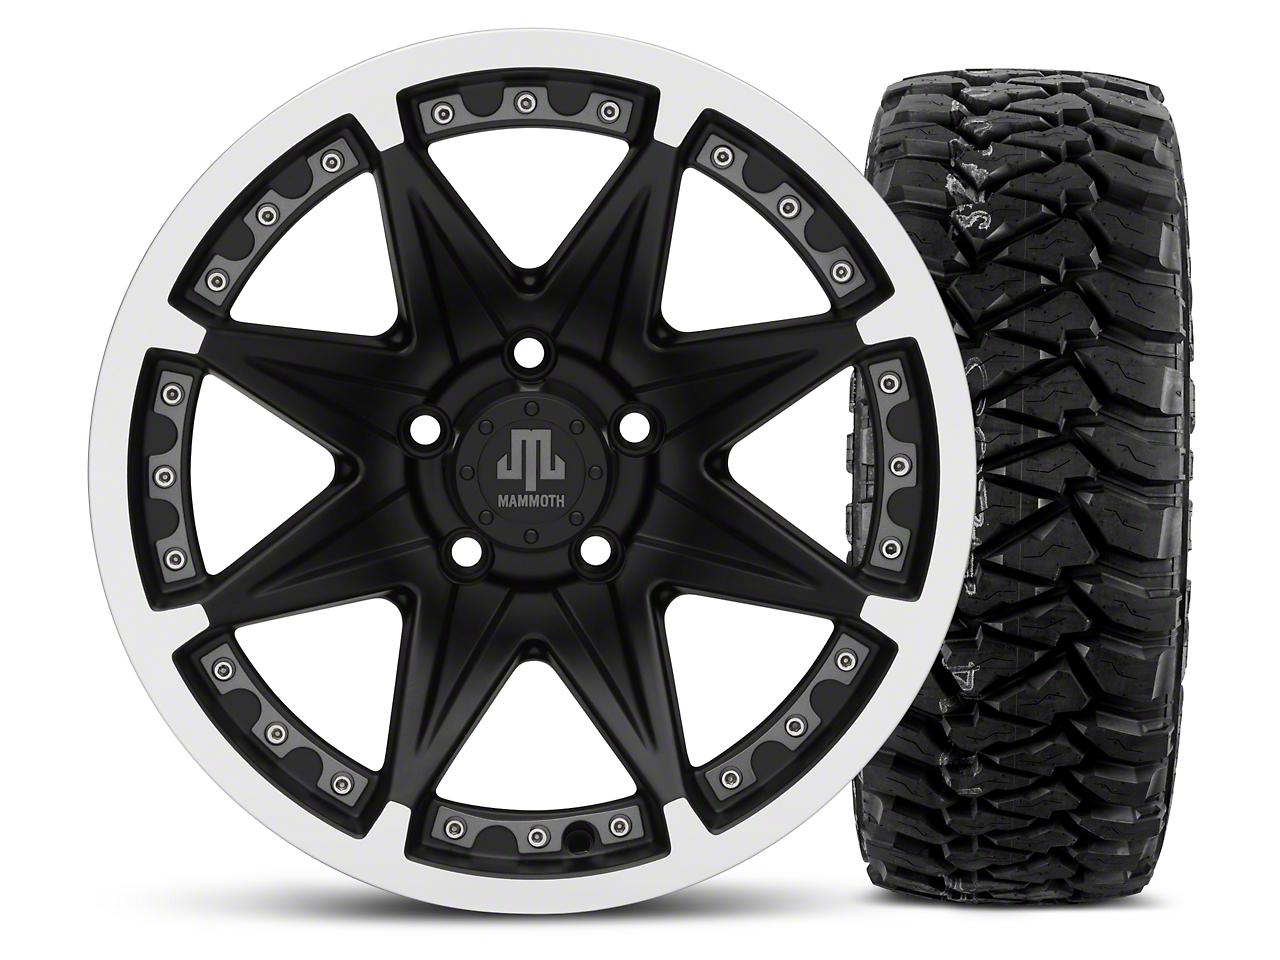 Mammoth Type 88 Black 16x8 Wheel & Mickey Thompson Baja MTZP3 305/70R16 Tire Kit (87-06 Jeep Wrangler YJ & TJ)